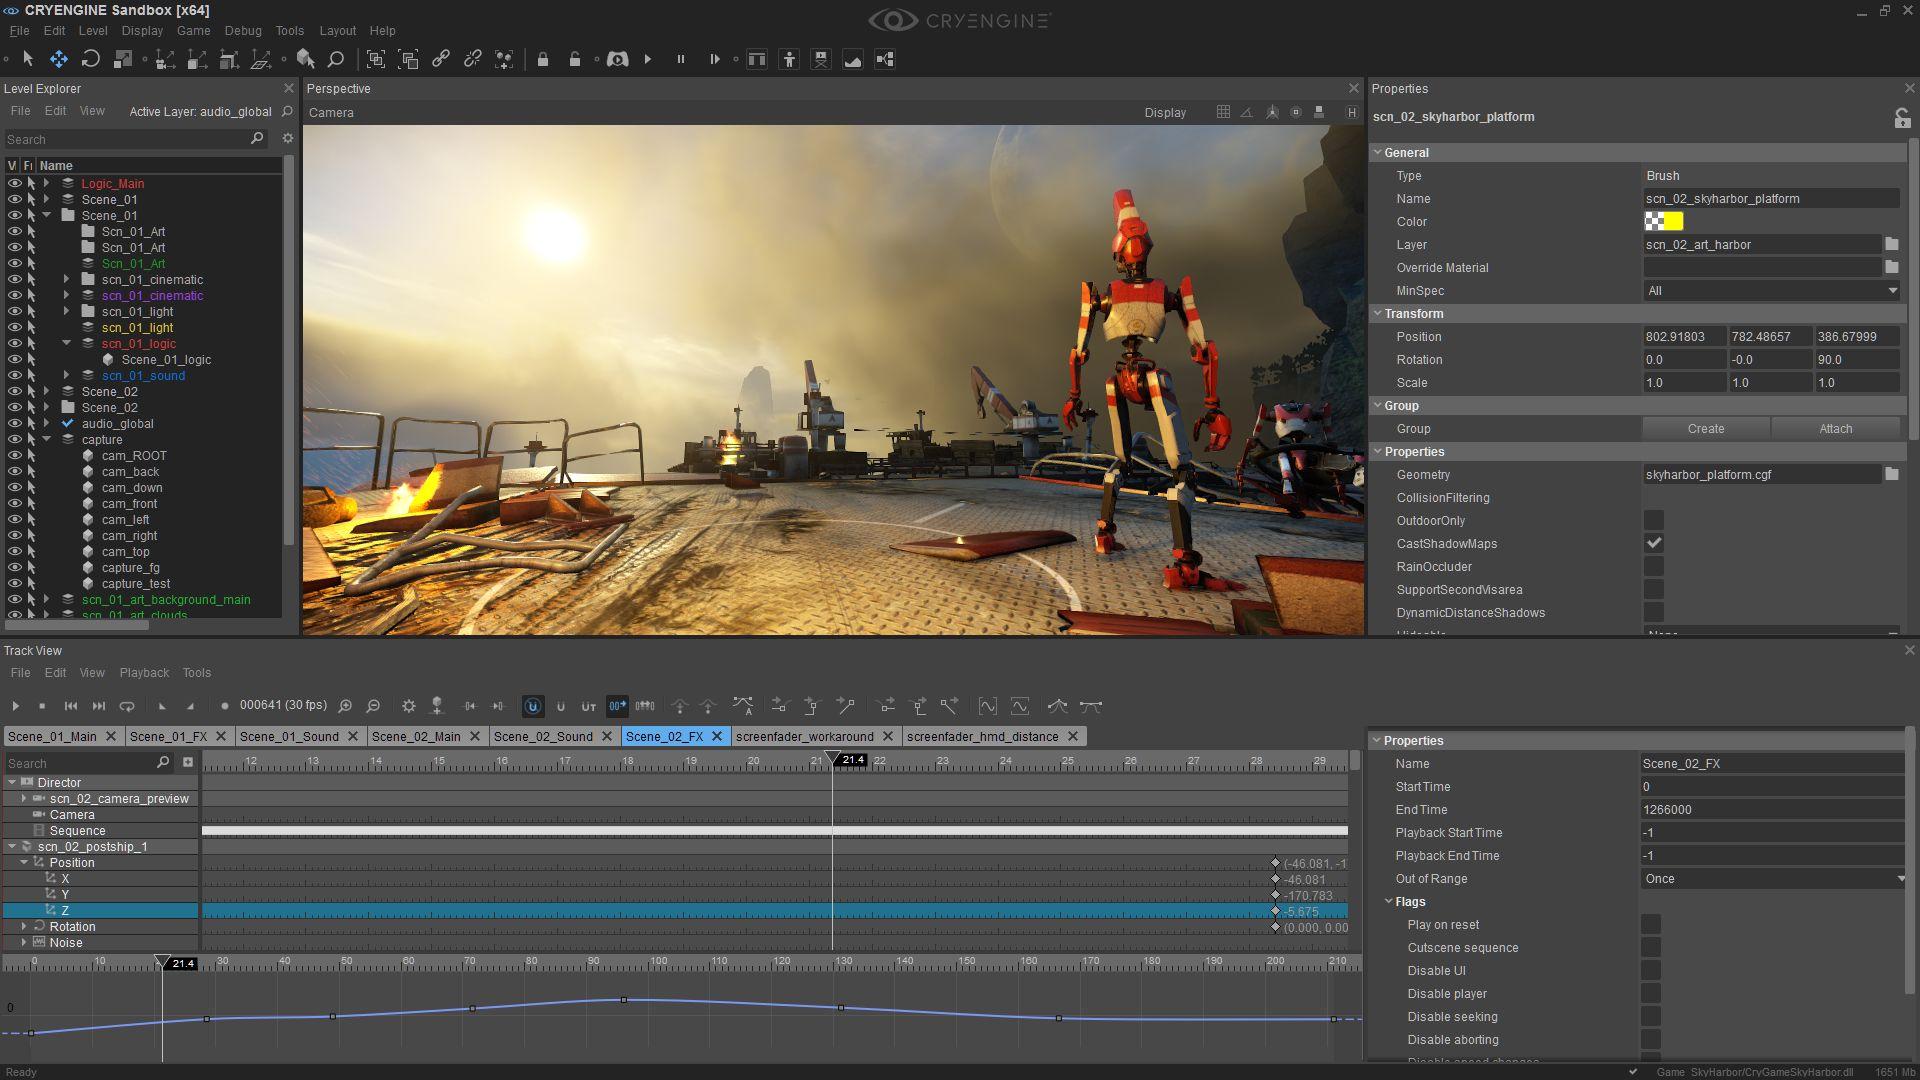 Cryengine 5 Sandbox Editor